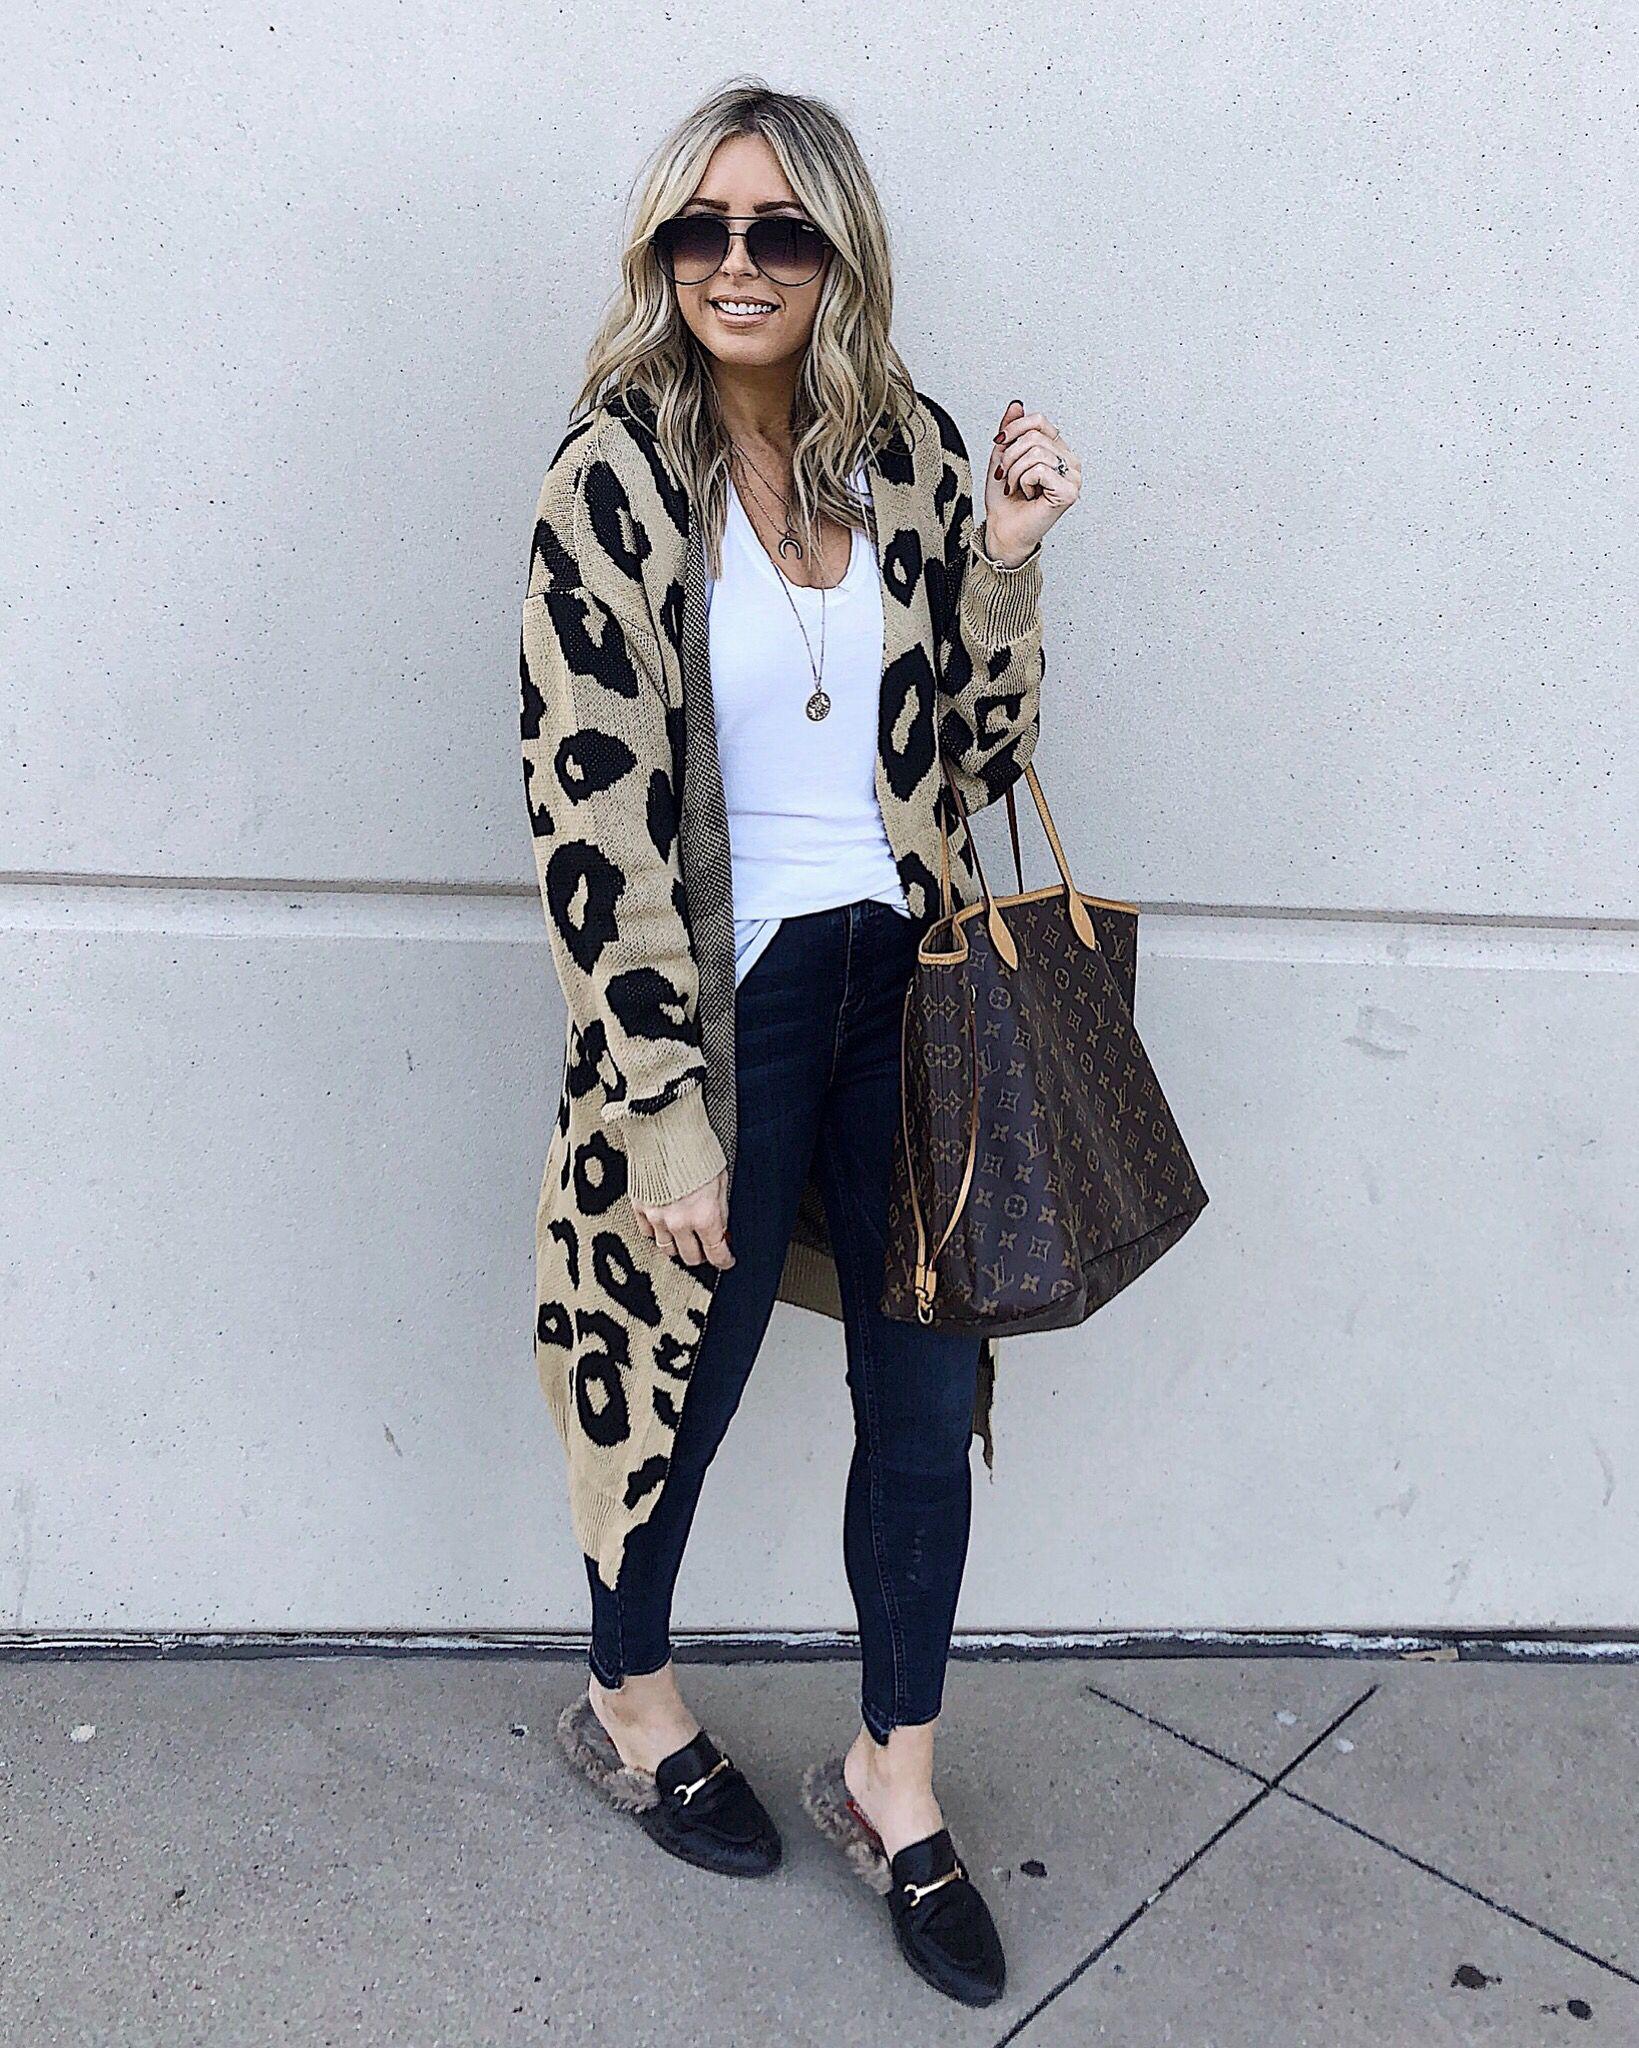 8b012559f Leopard cardigan, jeans outfit, fall fashion, gucci mules outfit, fur  mules, fur mules fall